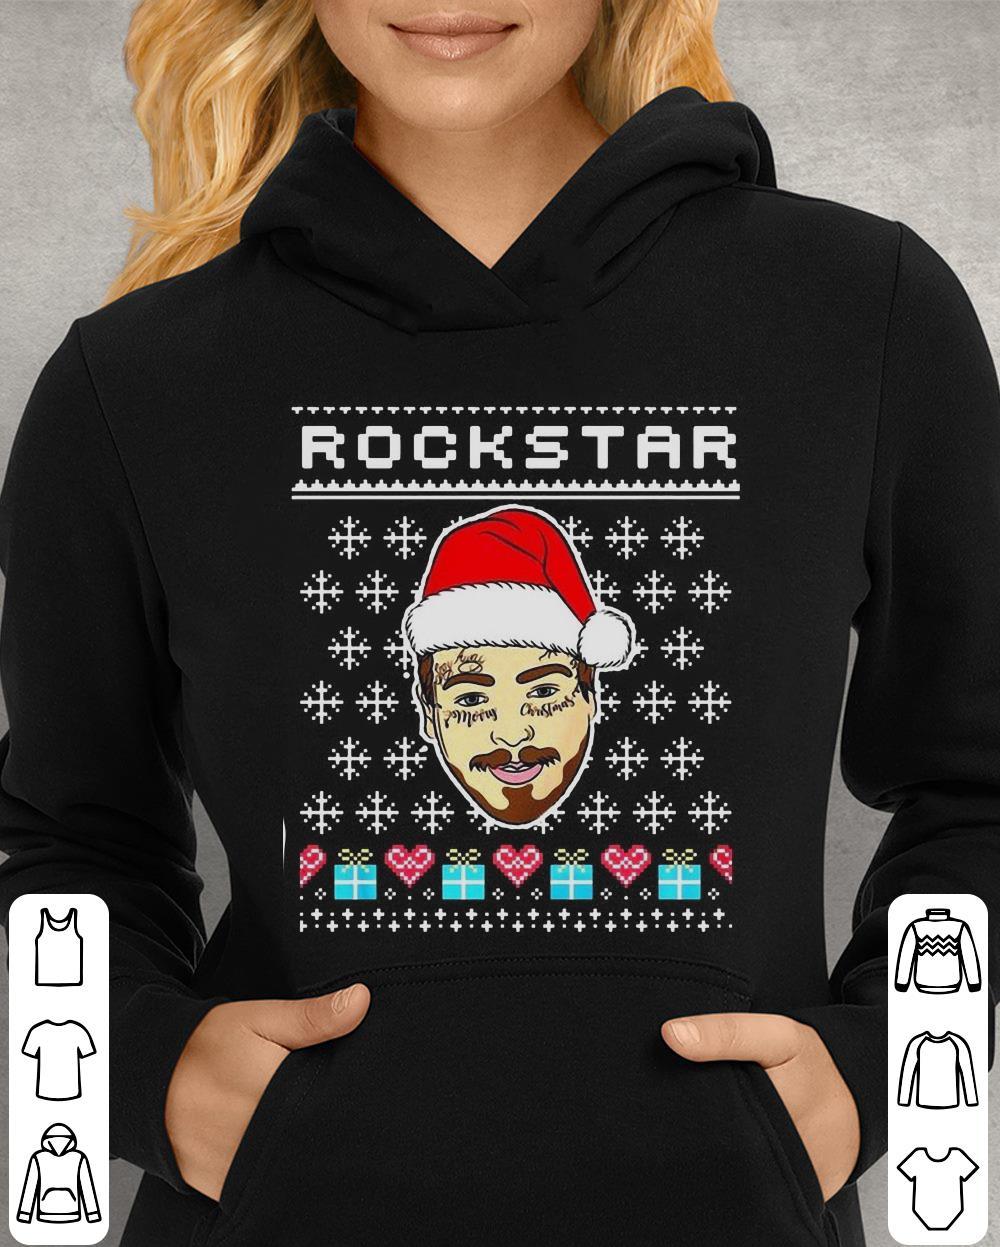 https://unicornshirts.net/images/2018/12/Merry-Christmas-Rockstar-Post-Malone-shirt_4.jpg